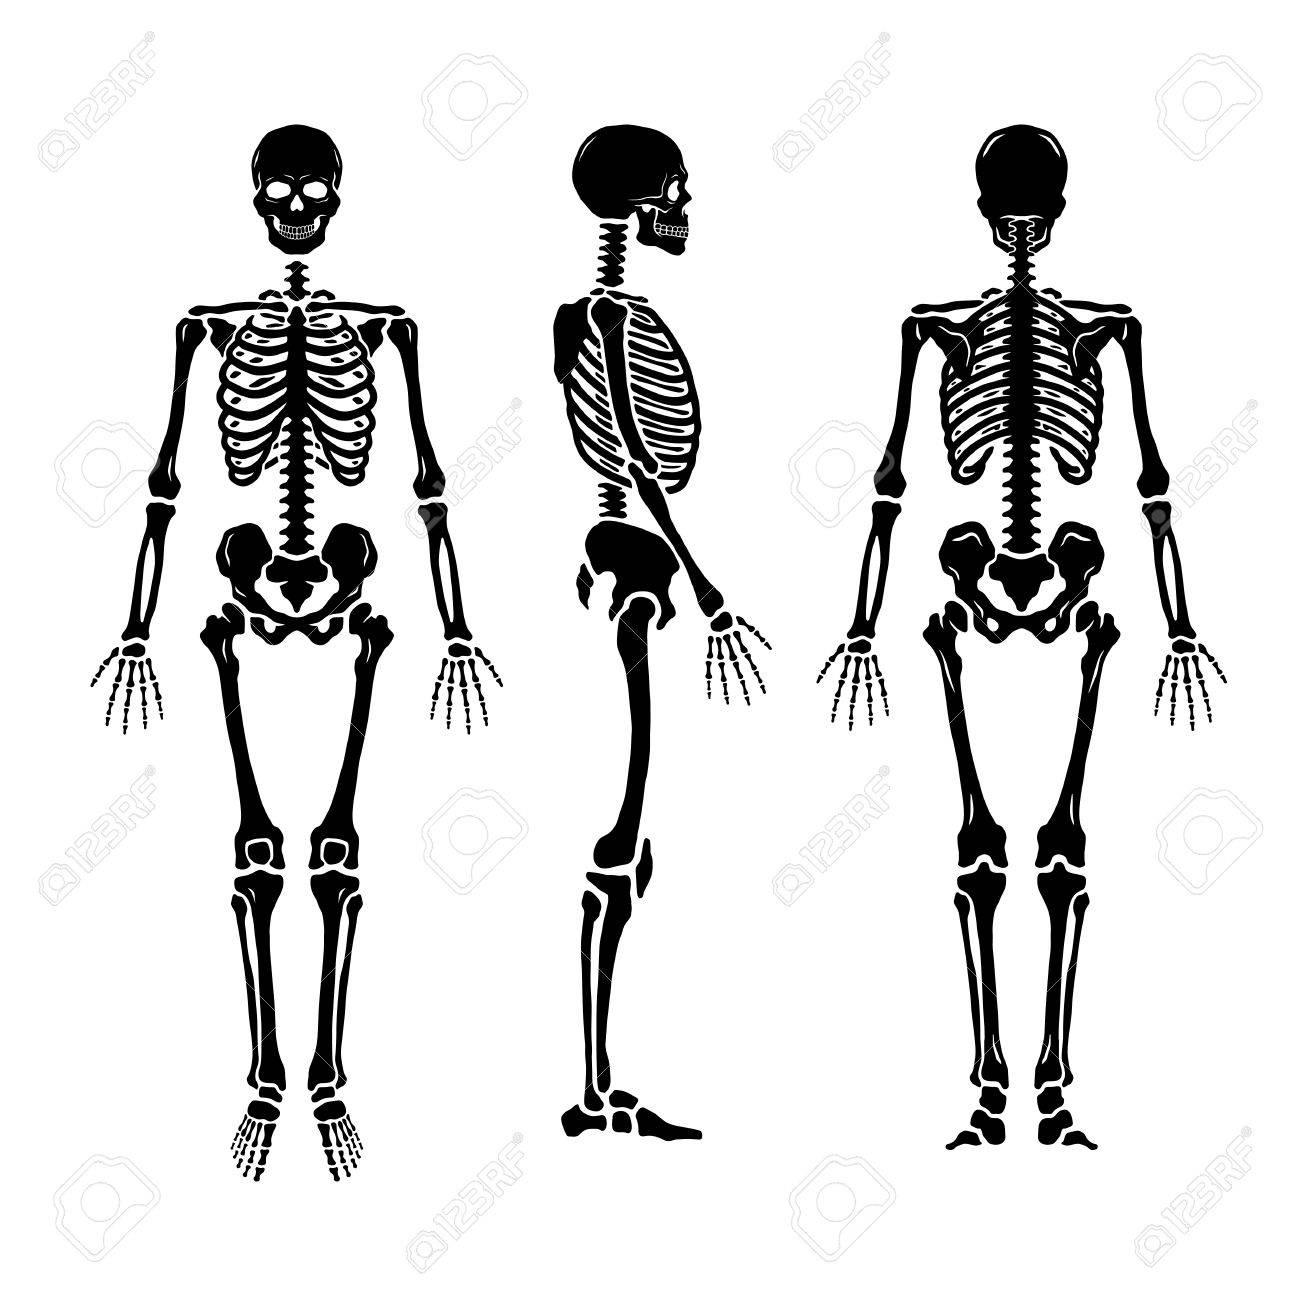 1300x1300 Human Skeleton Stock Illustration. Illustration Of Position